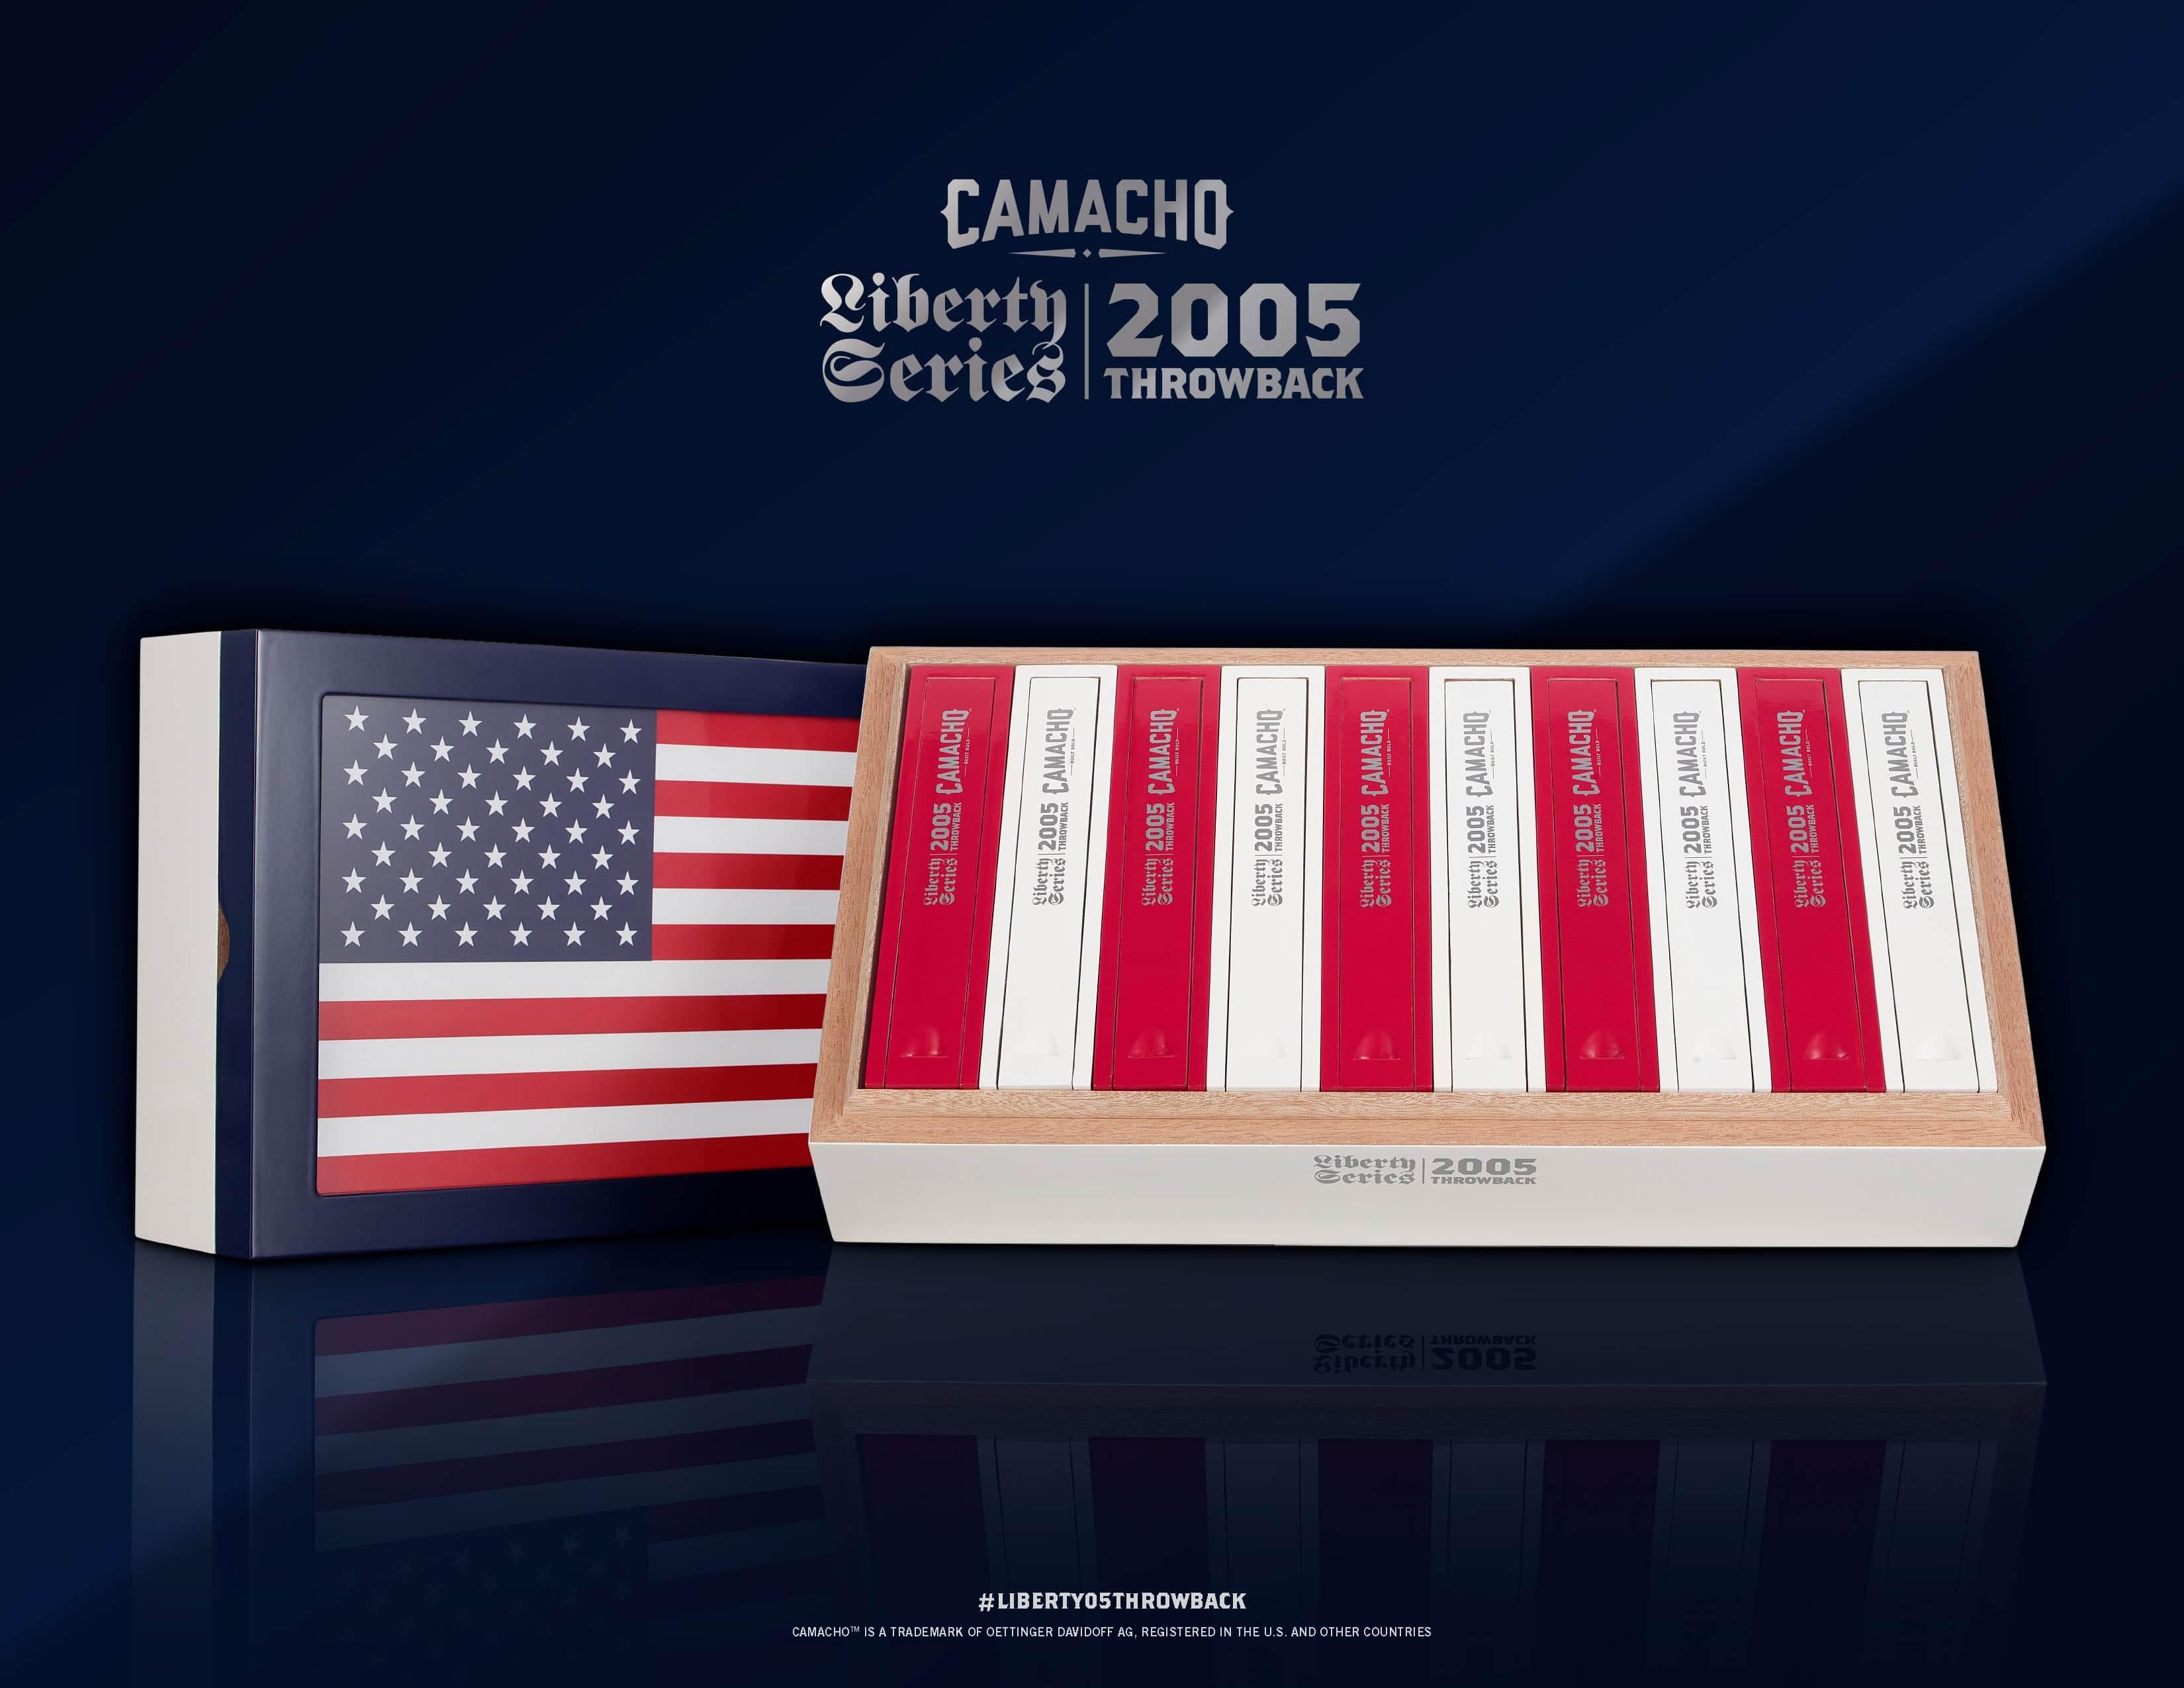 Cigar News: Camacho Announces Liberty Throwback 2005